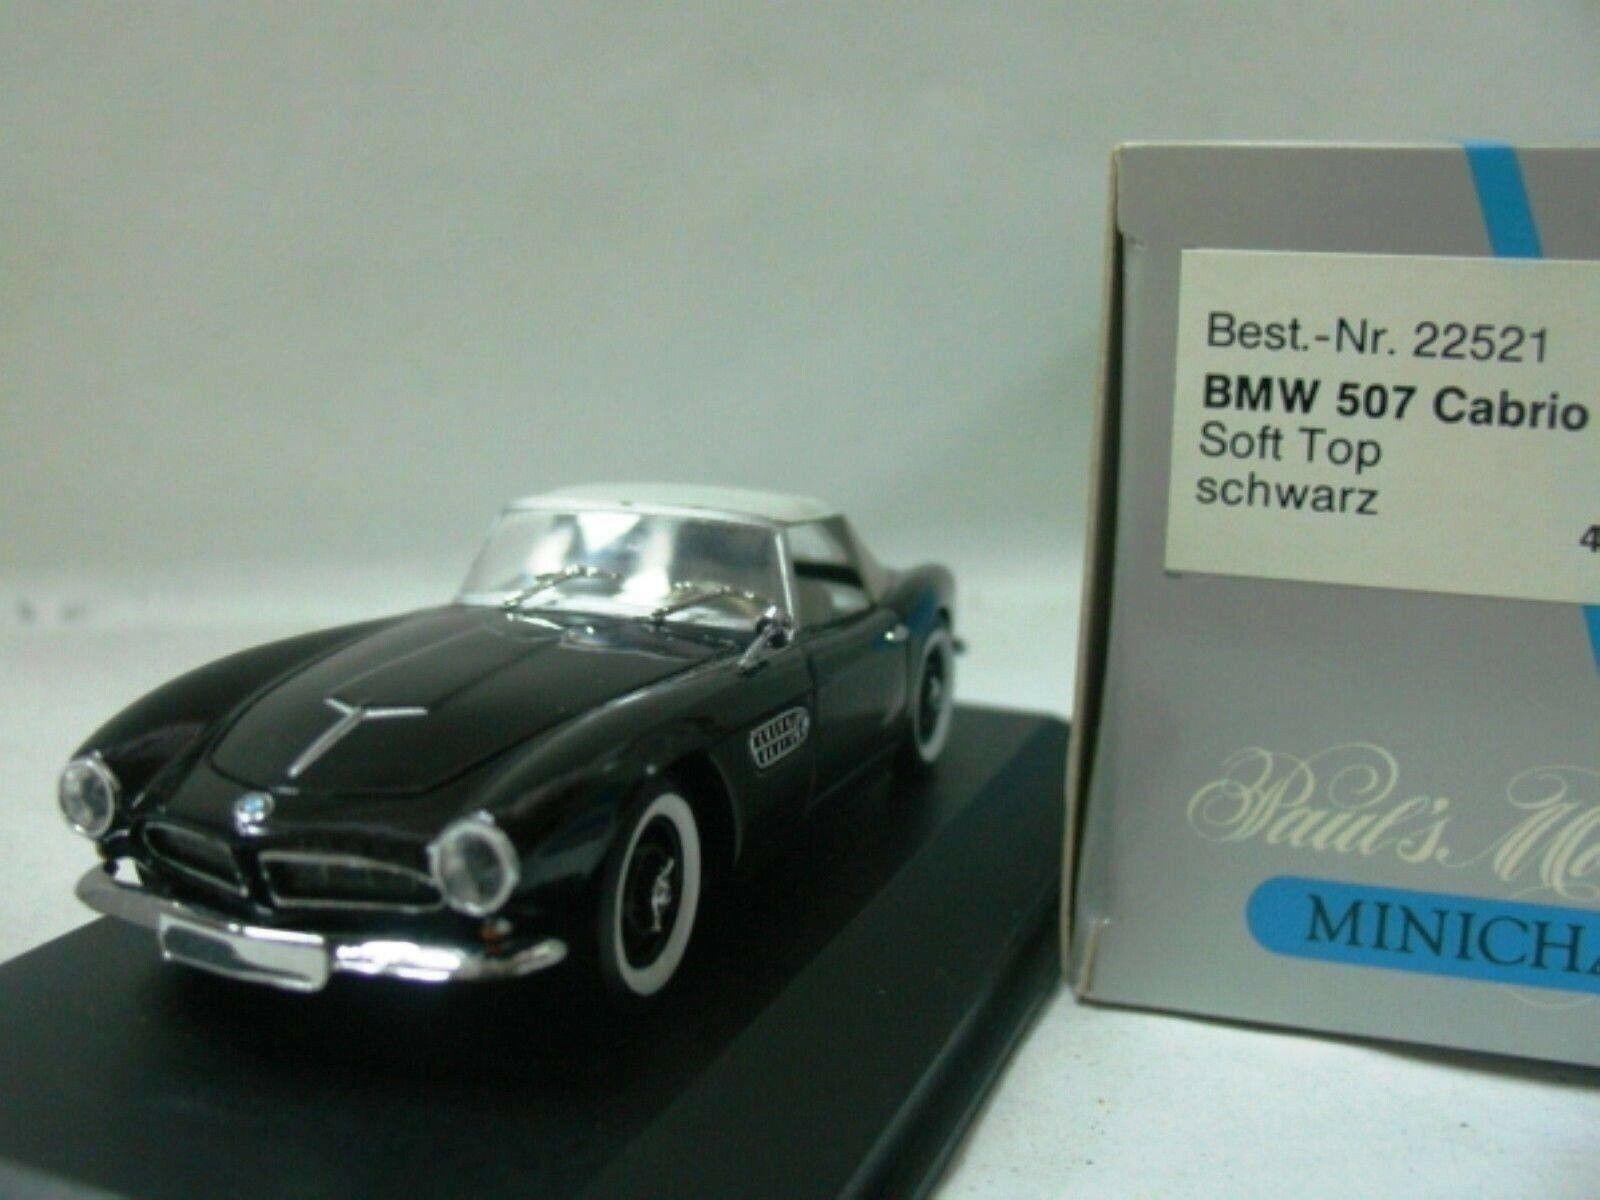 Wow extremadonnate raro BMW 507 3.2 V8 1956 nero biancao Suave Superior 1 43 Minichamps - 2002